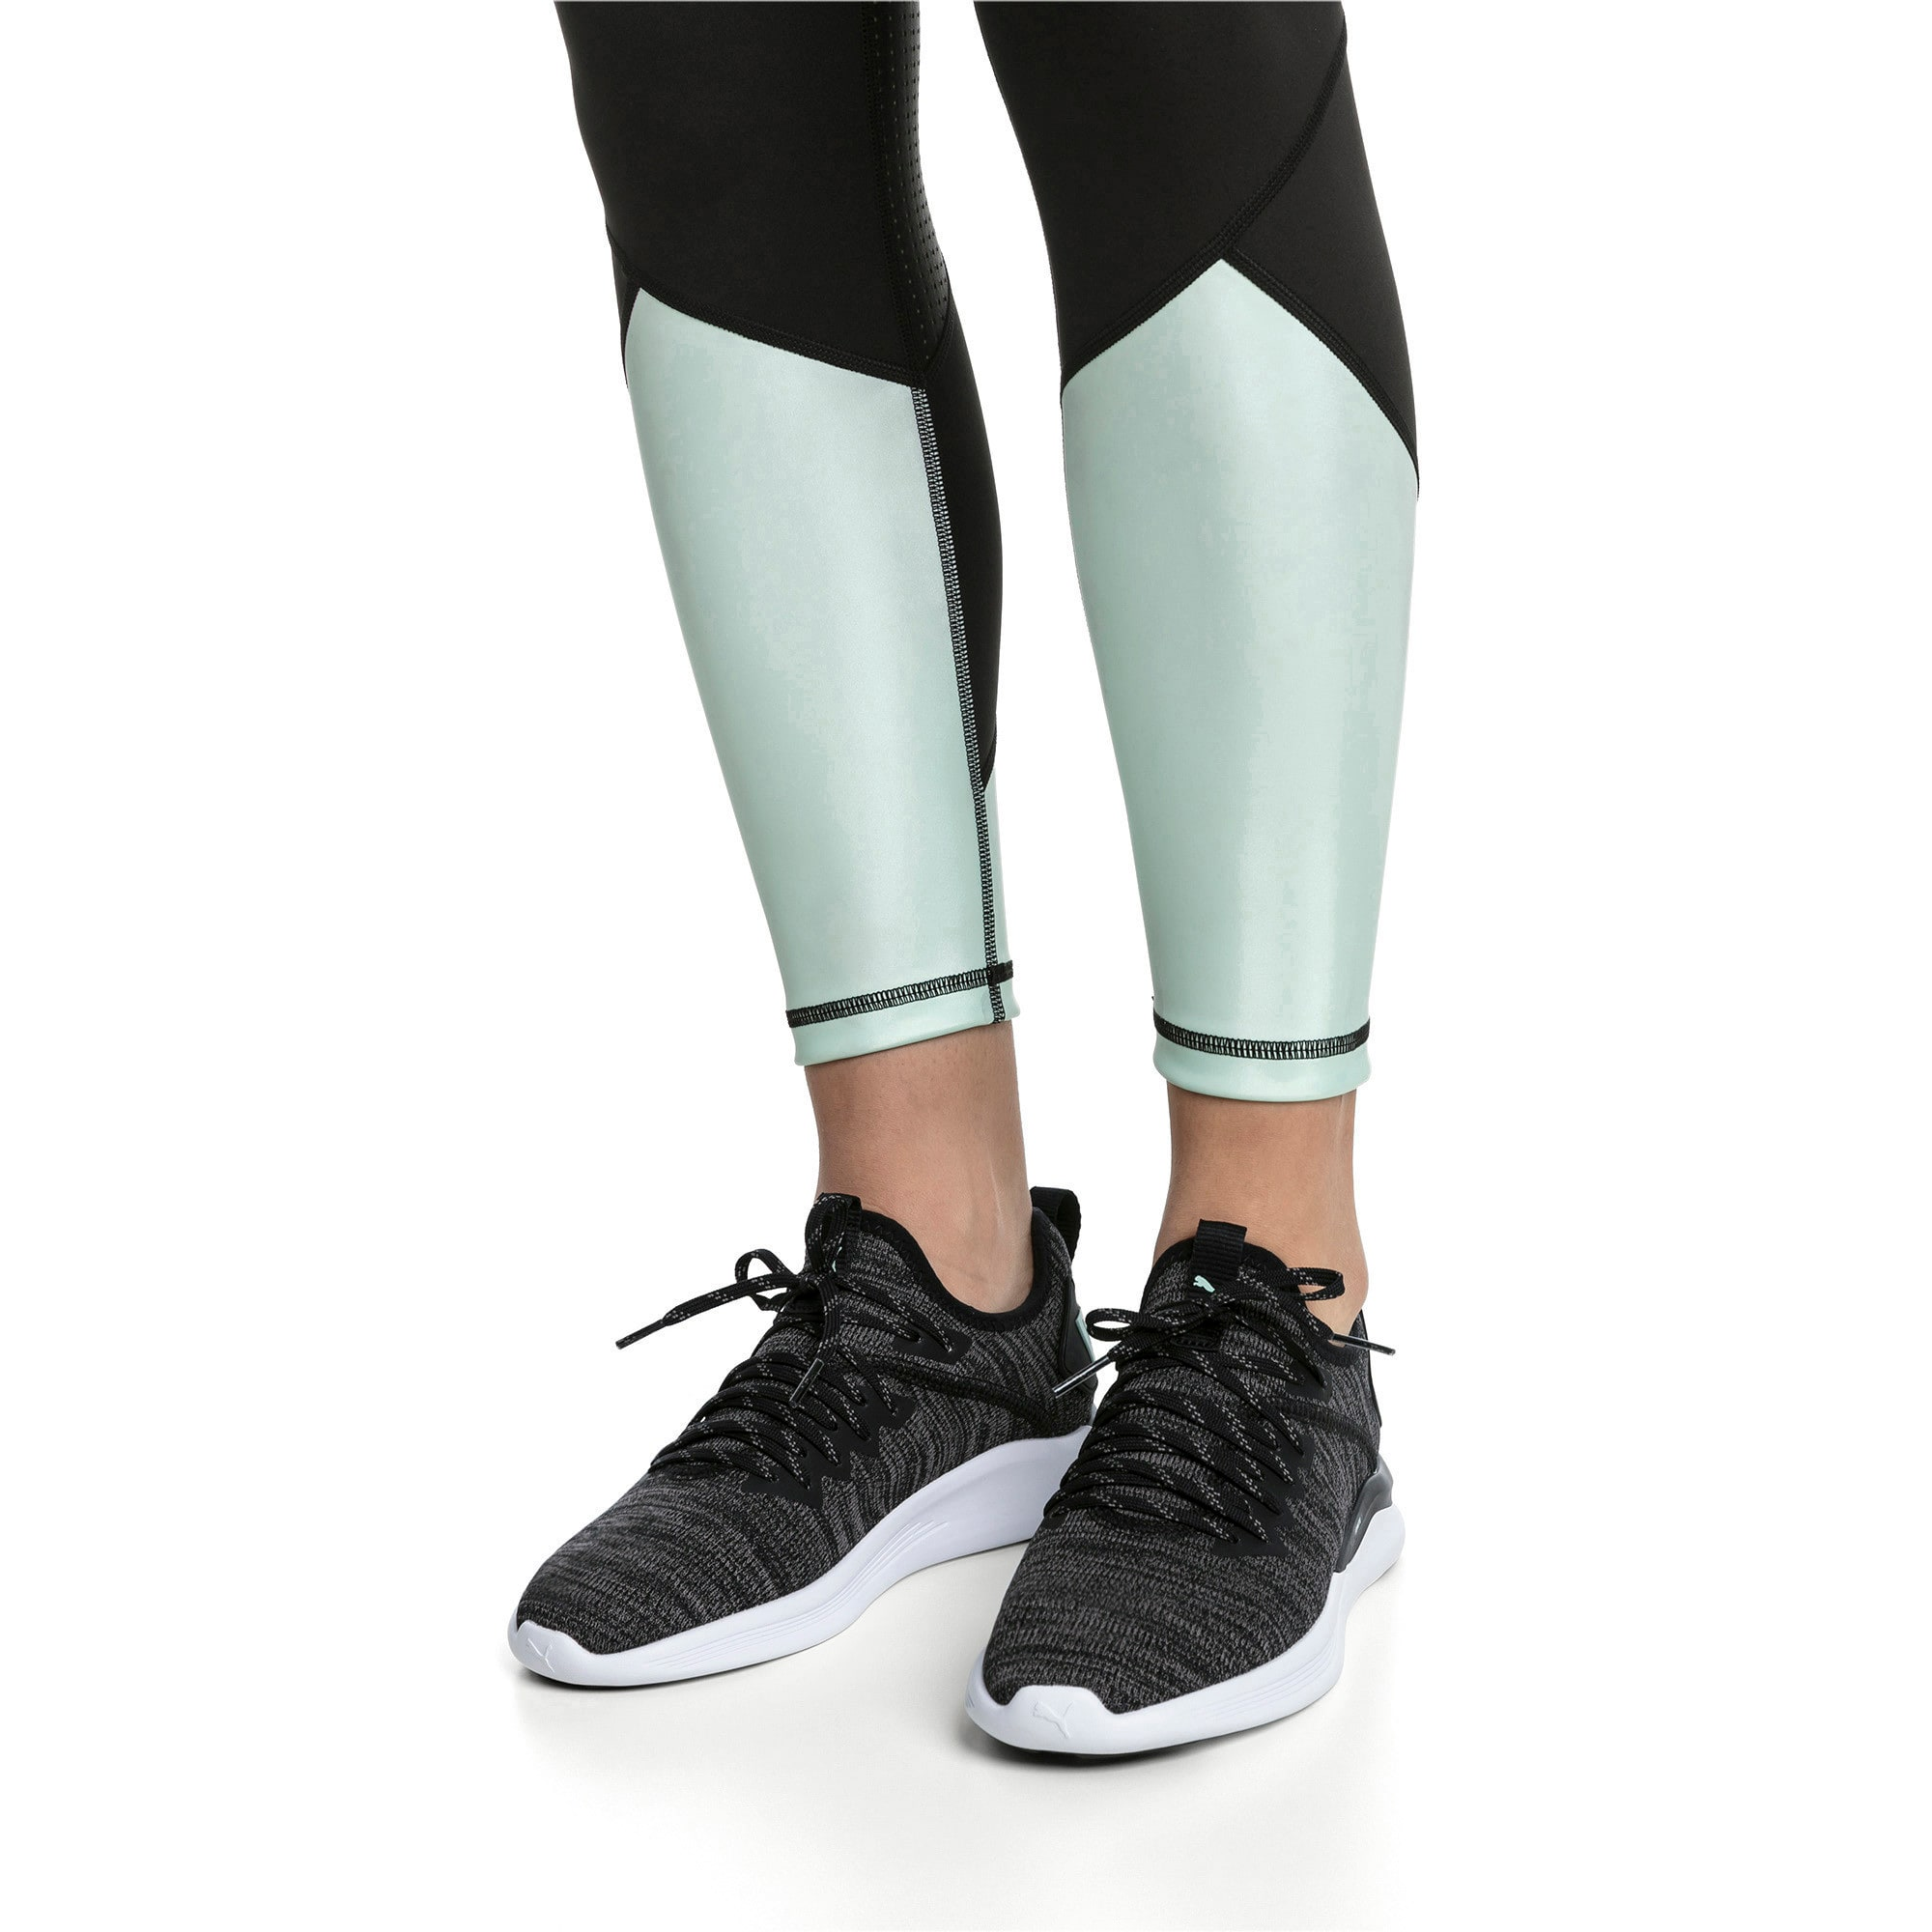 Thumbnail 2 of IGNITE Flash evoKNIT Women's Running Shoes, Black-Charcoal-Fair Aqua, medium-IND